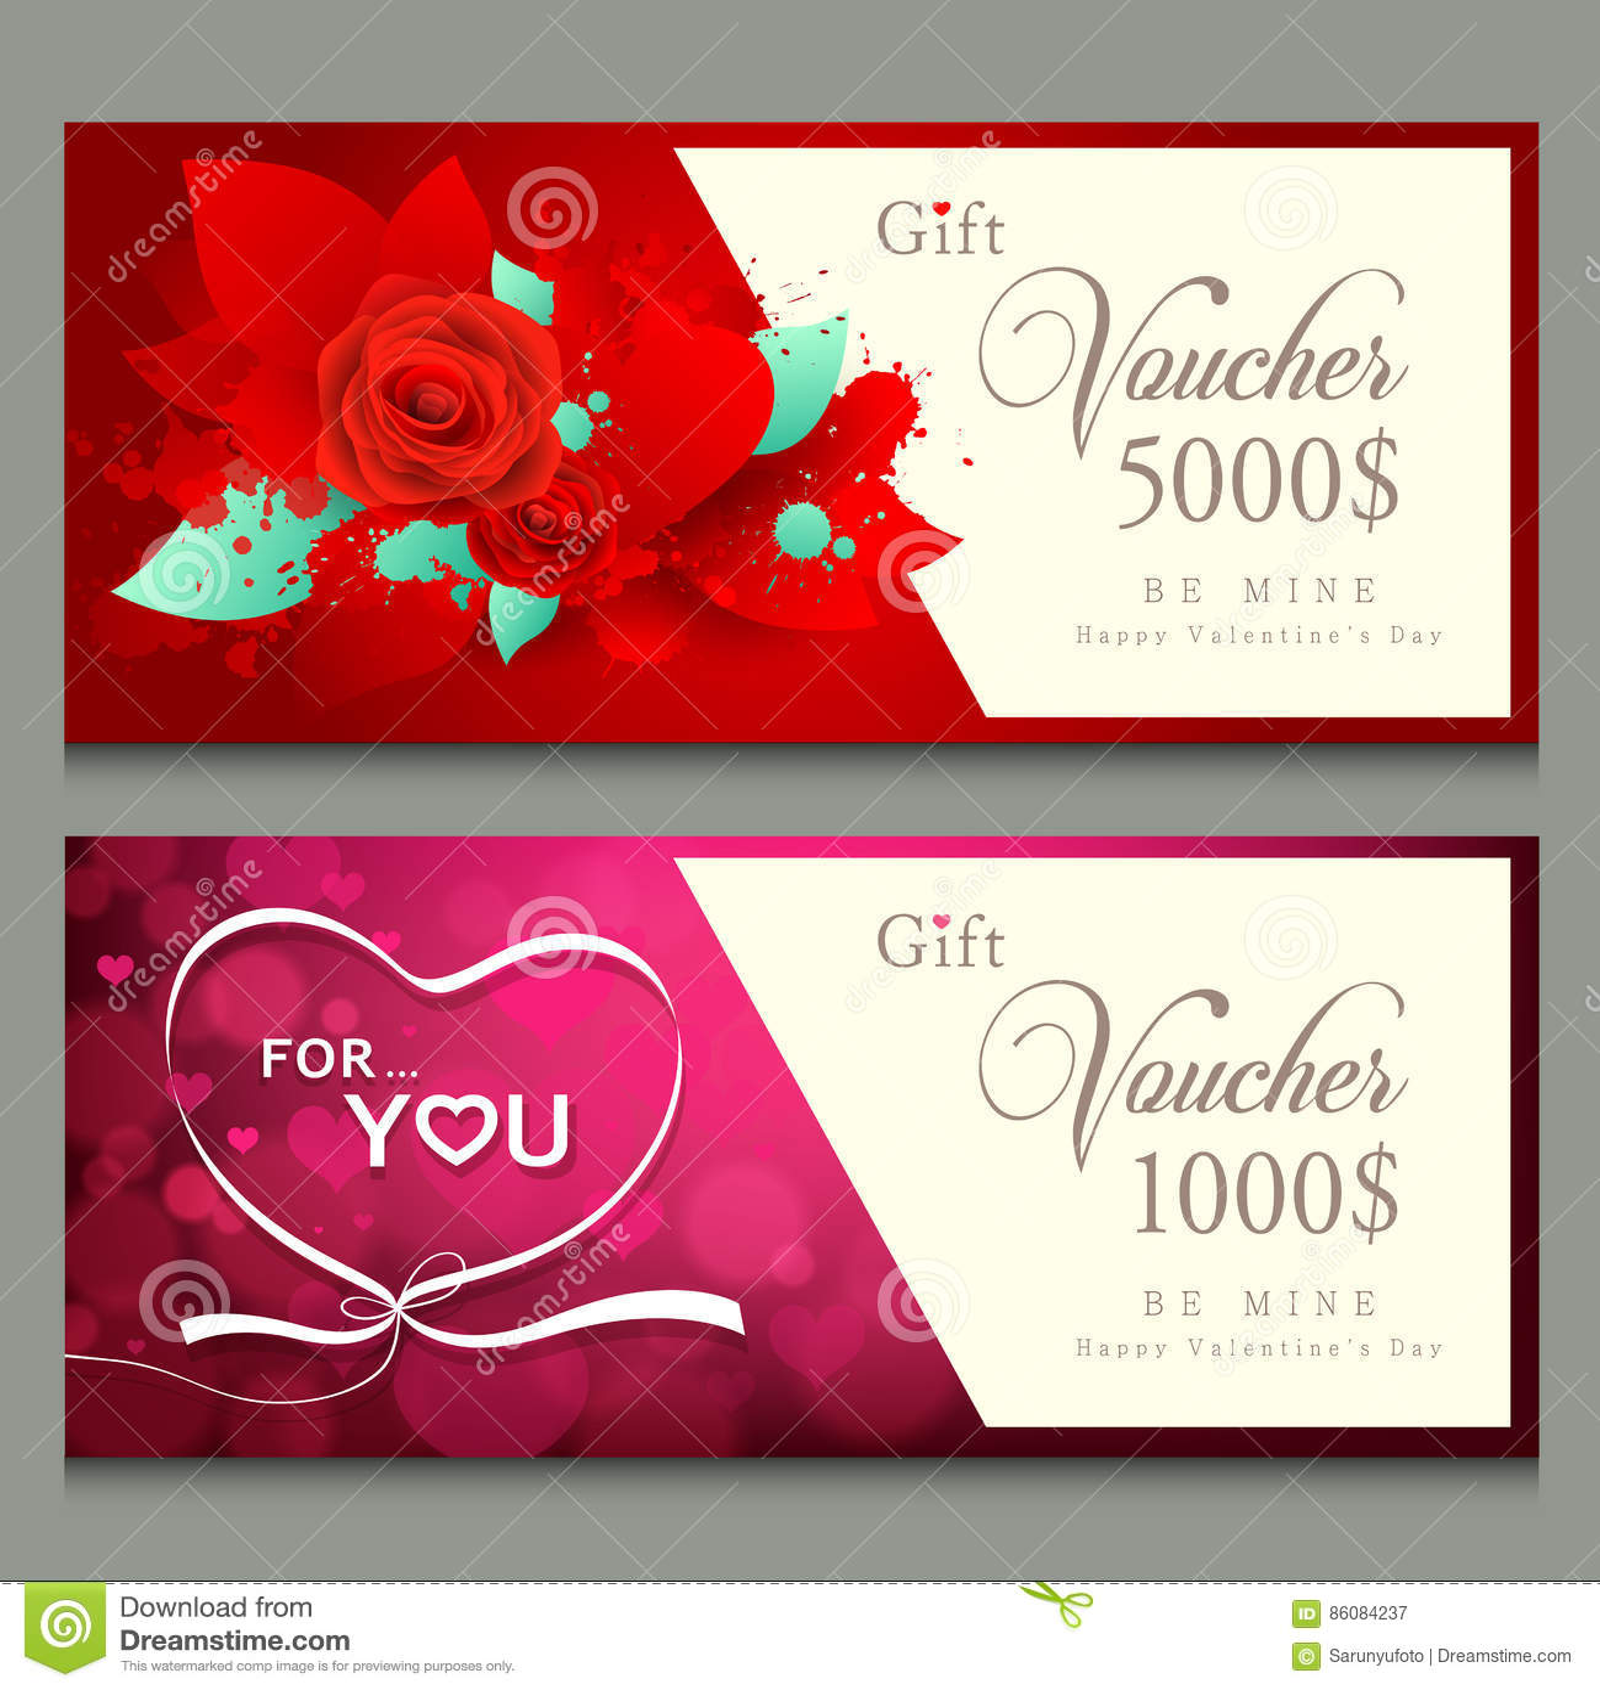 Vector Illustration Gift Voucher Happy Valentine Day Stock Vector